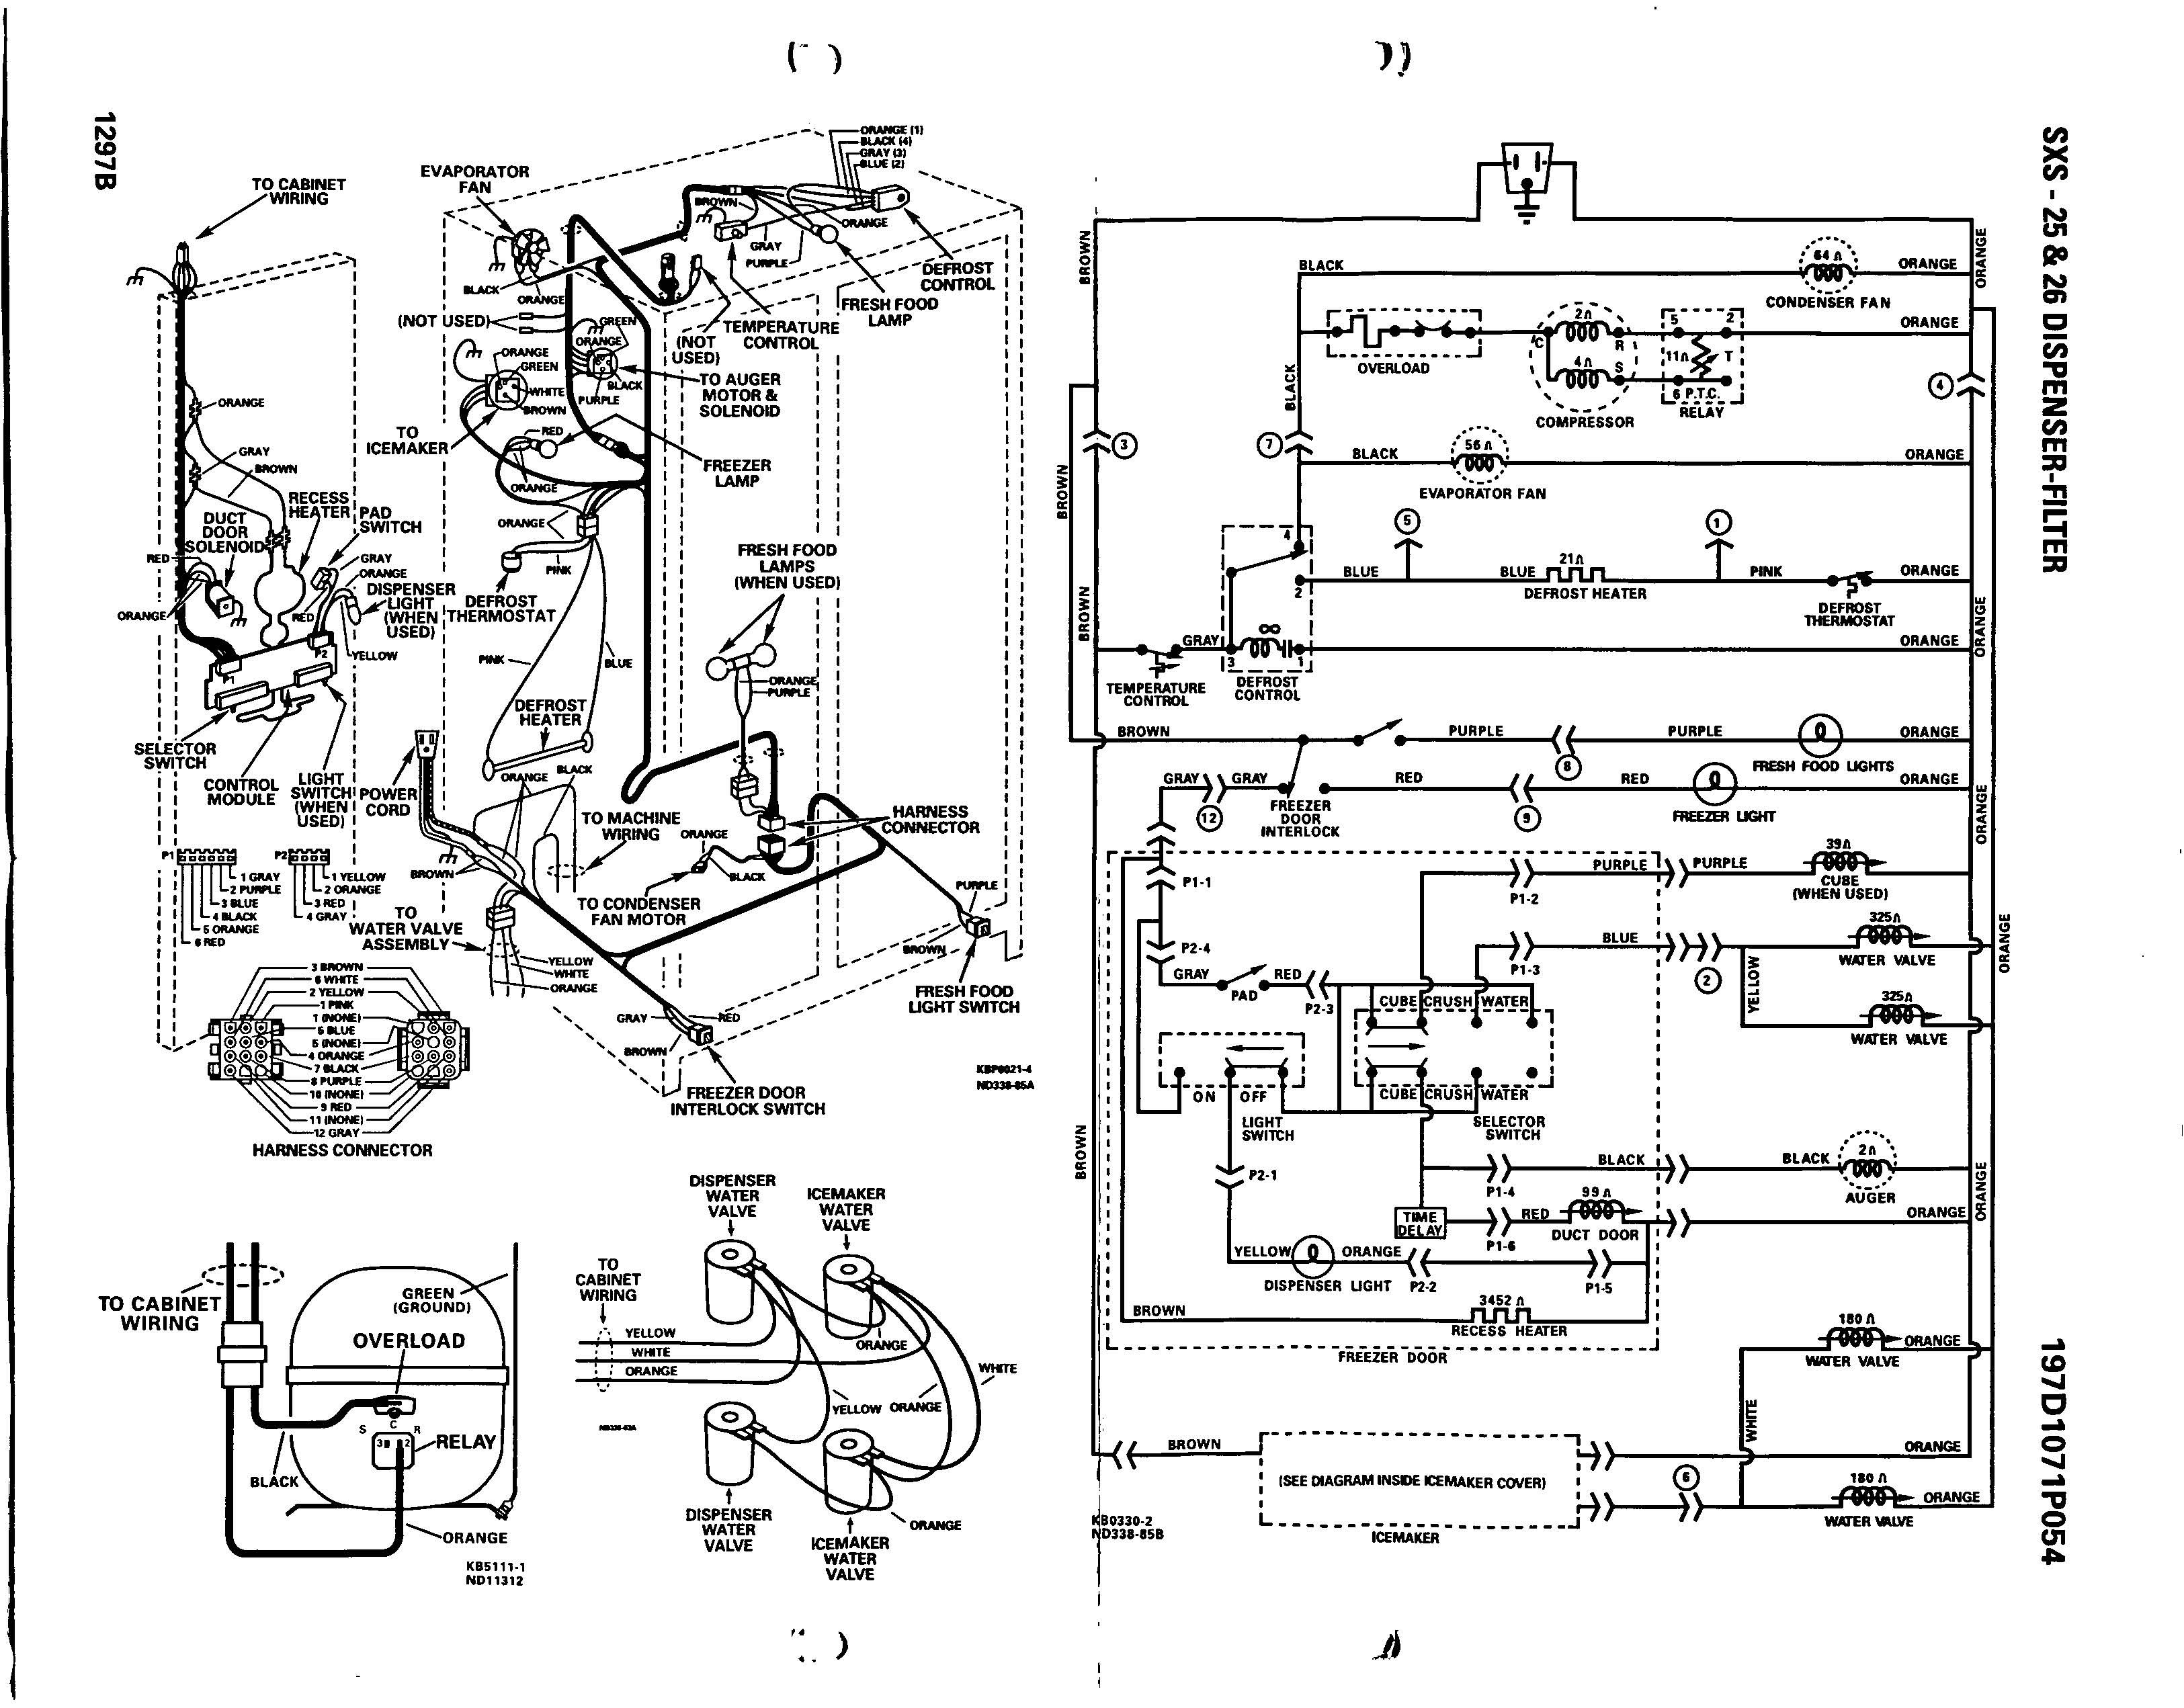 Wiring Diagram For Frigidaire Upright Freezer Wiring